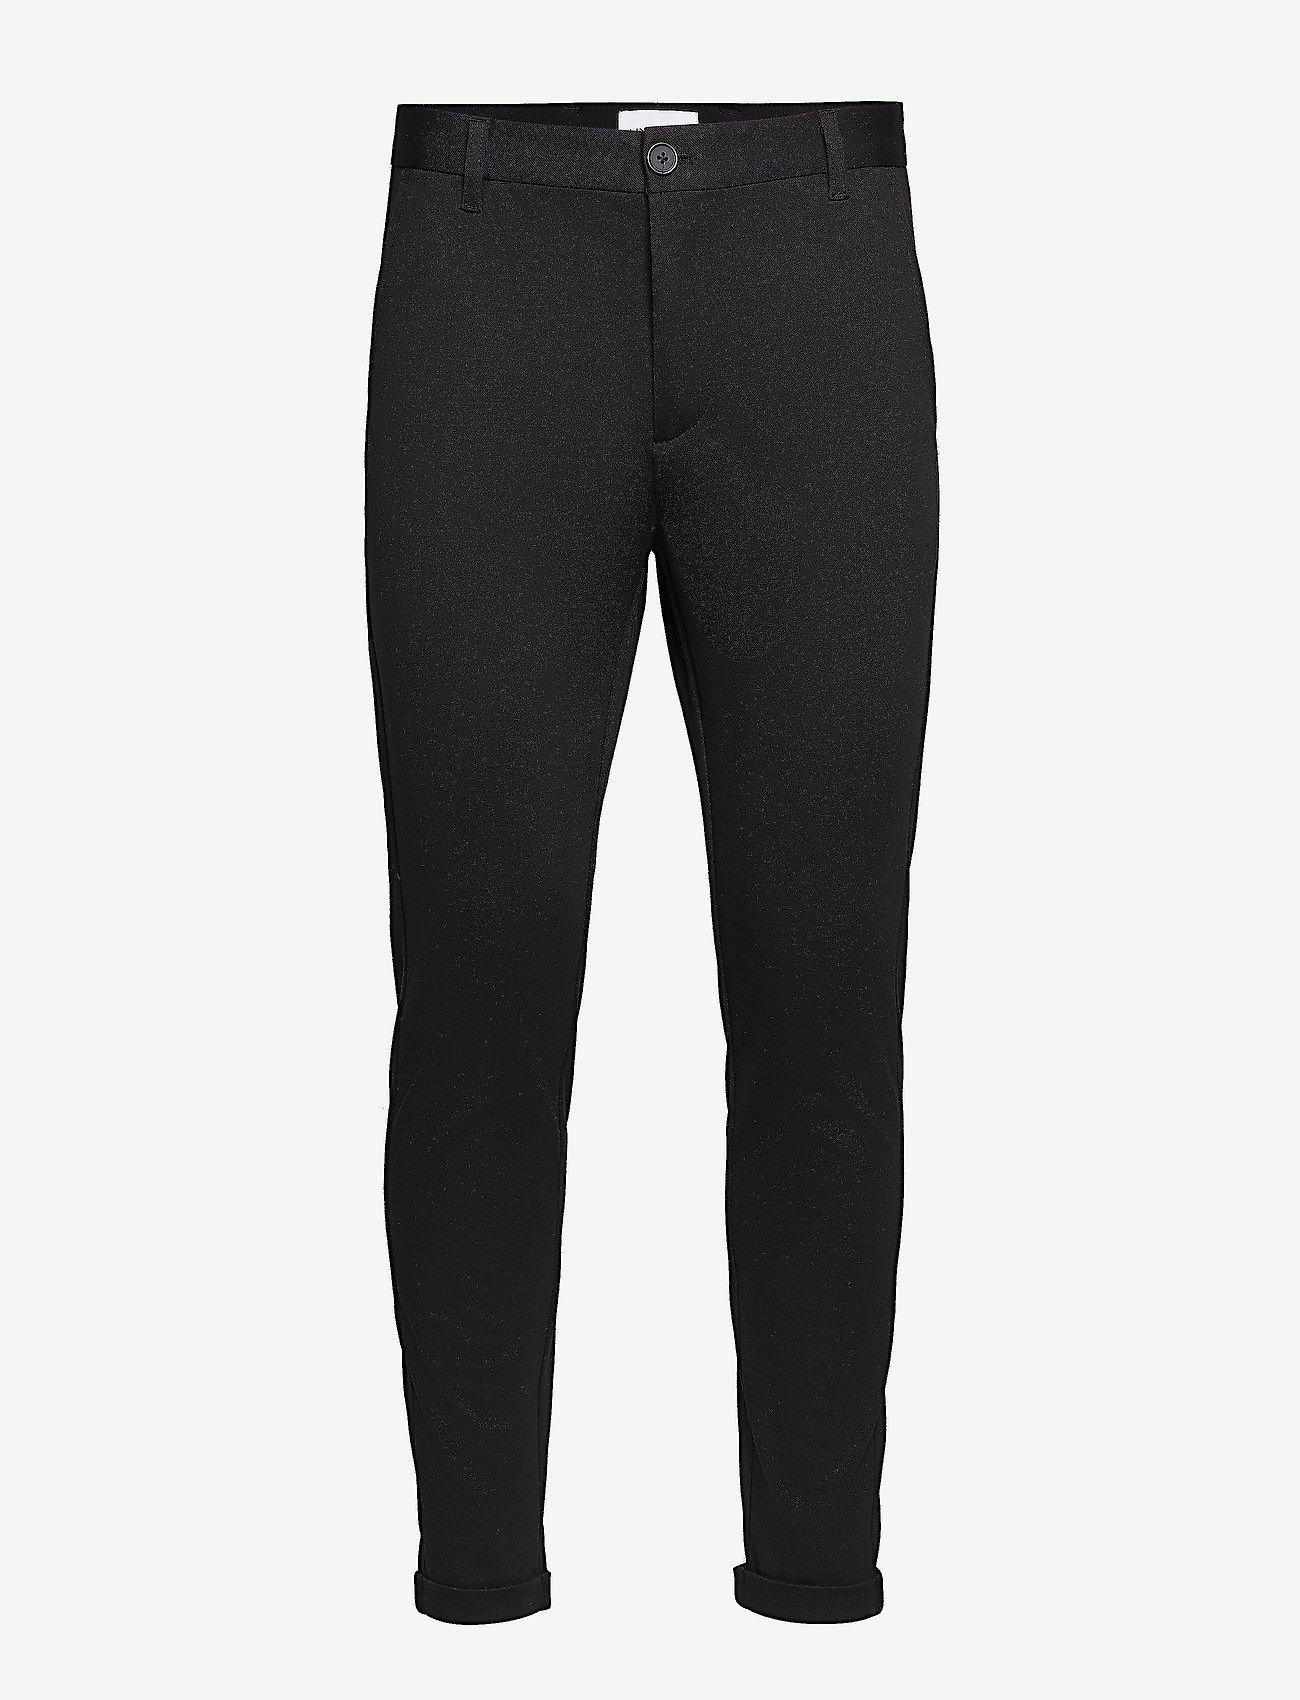 Lindbergh - Superflex knitted cropped pant - puvunhousut - black - 1